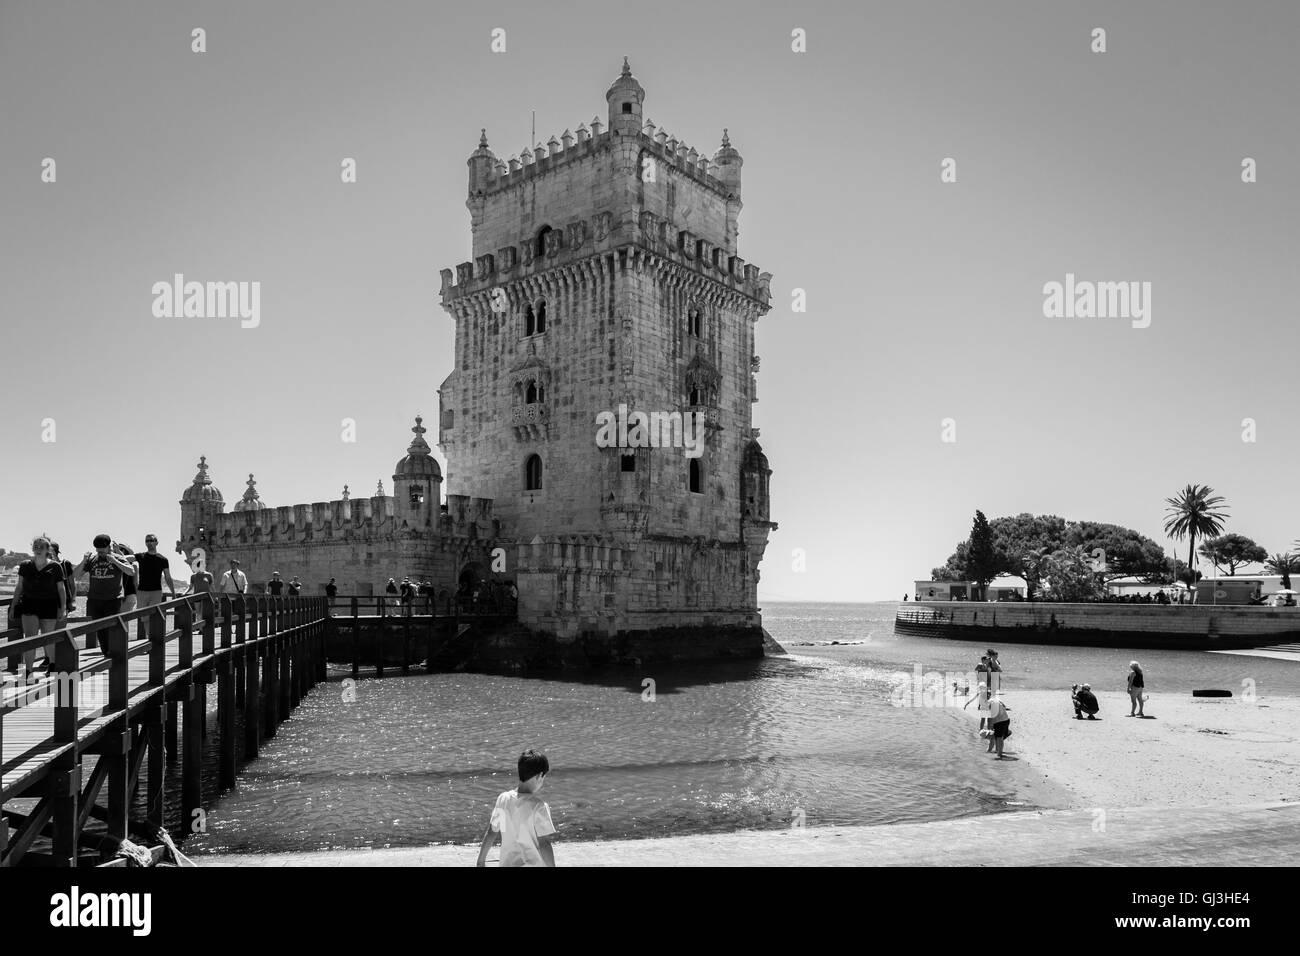 Belem Tower in Lisbon, Portugal. - Stock Image